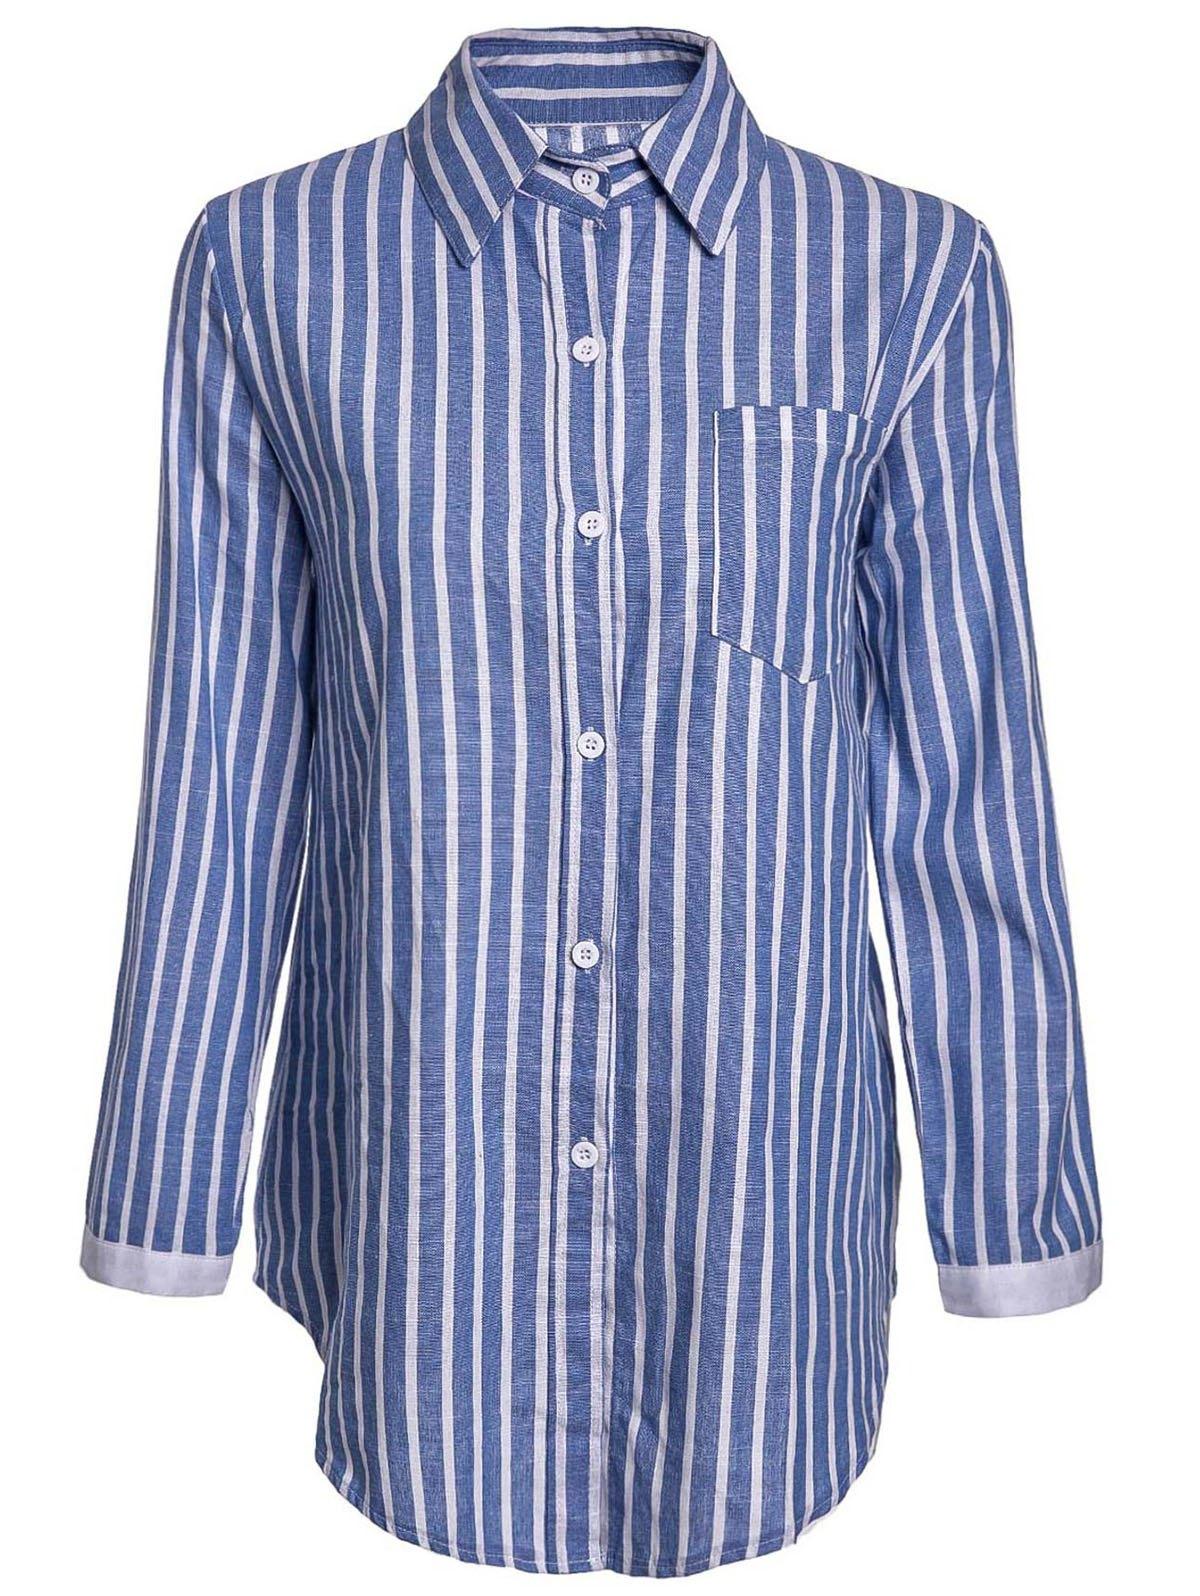 Turn Down Neck Long Sleeve Blue Stripe Shirt